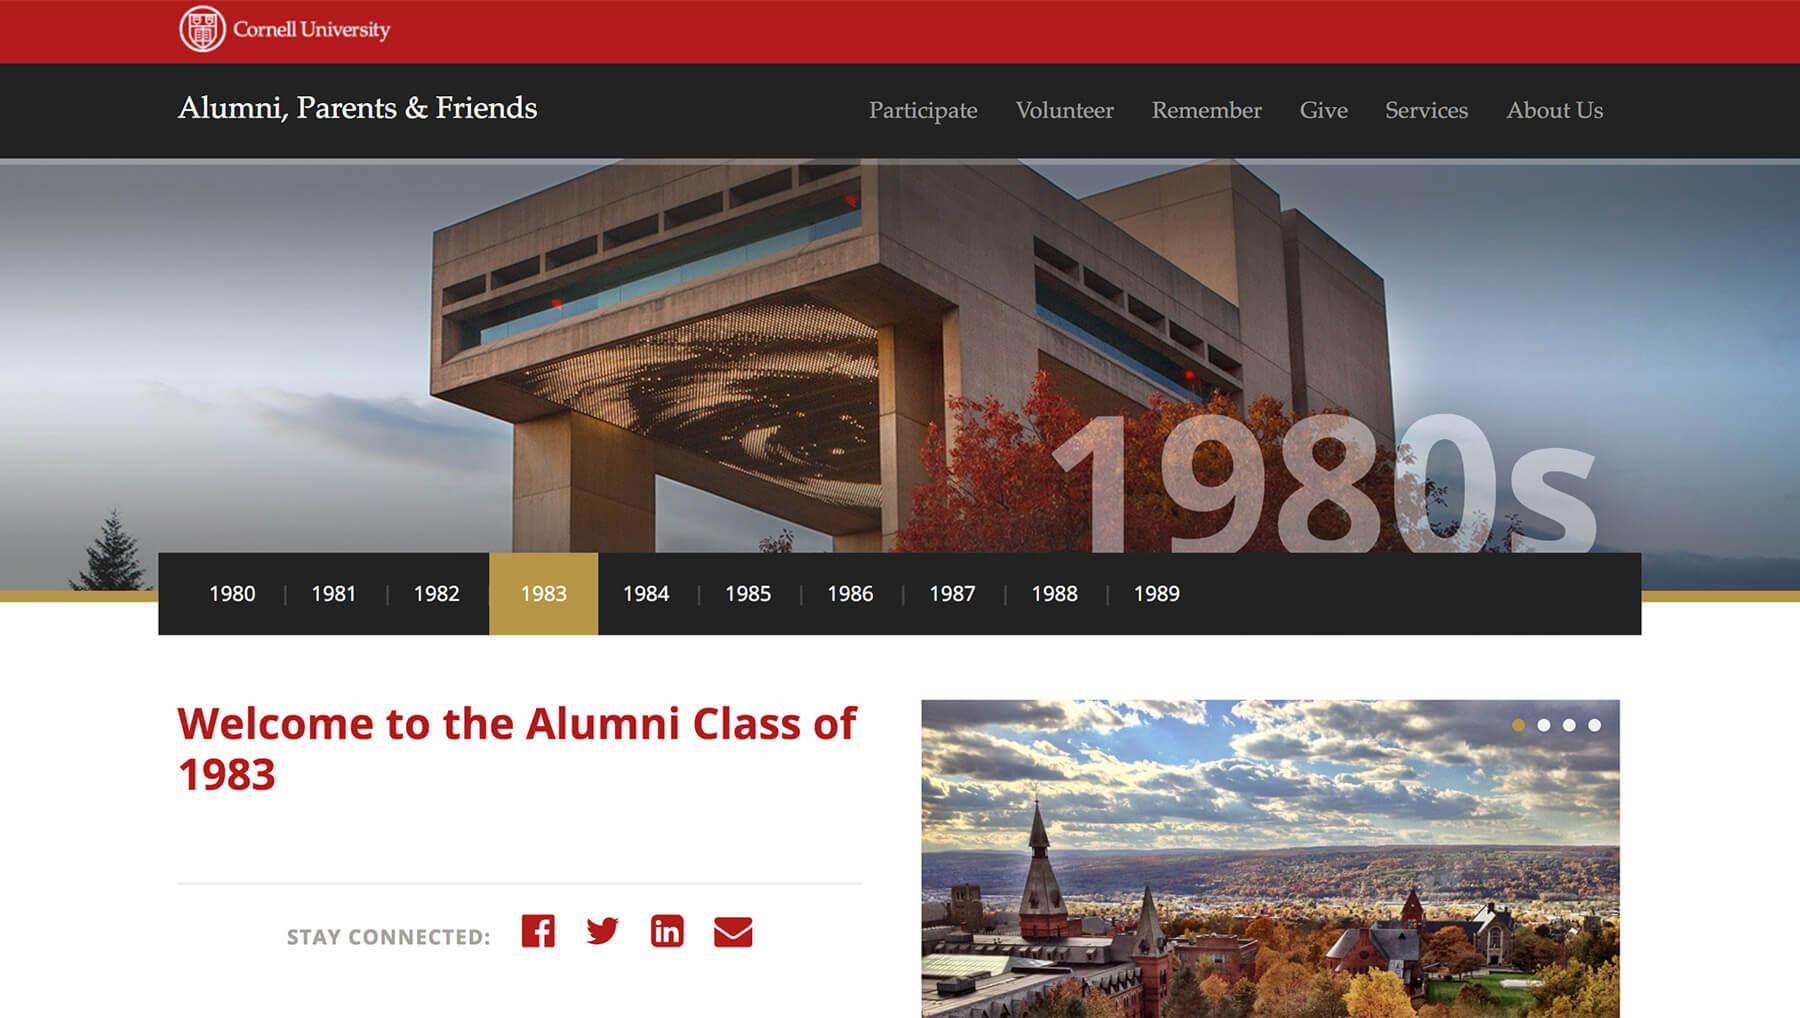 Cornell Alumni Class of 1983 page